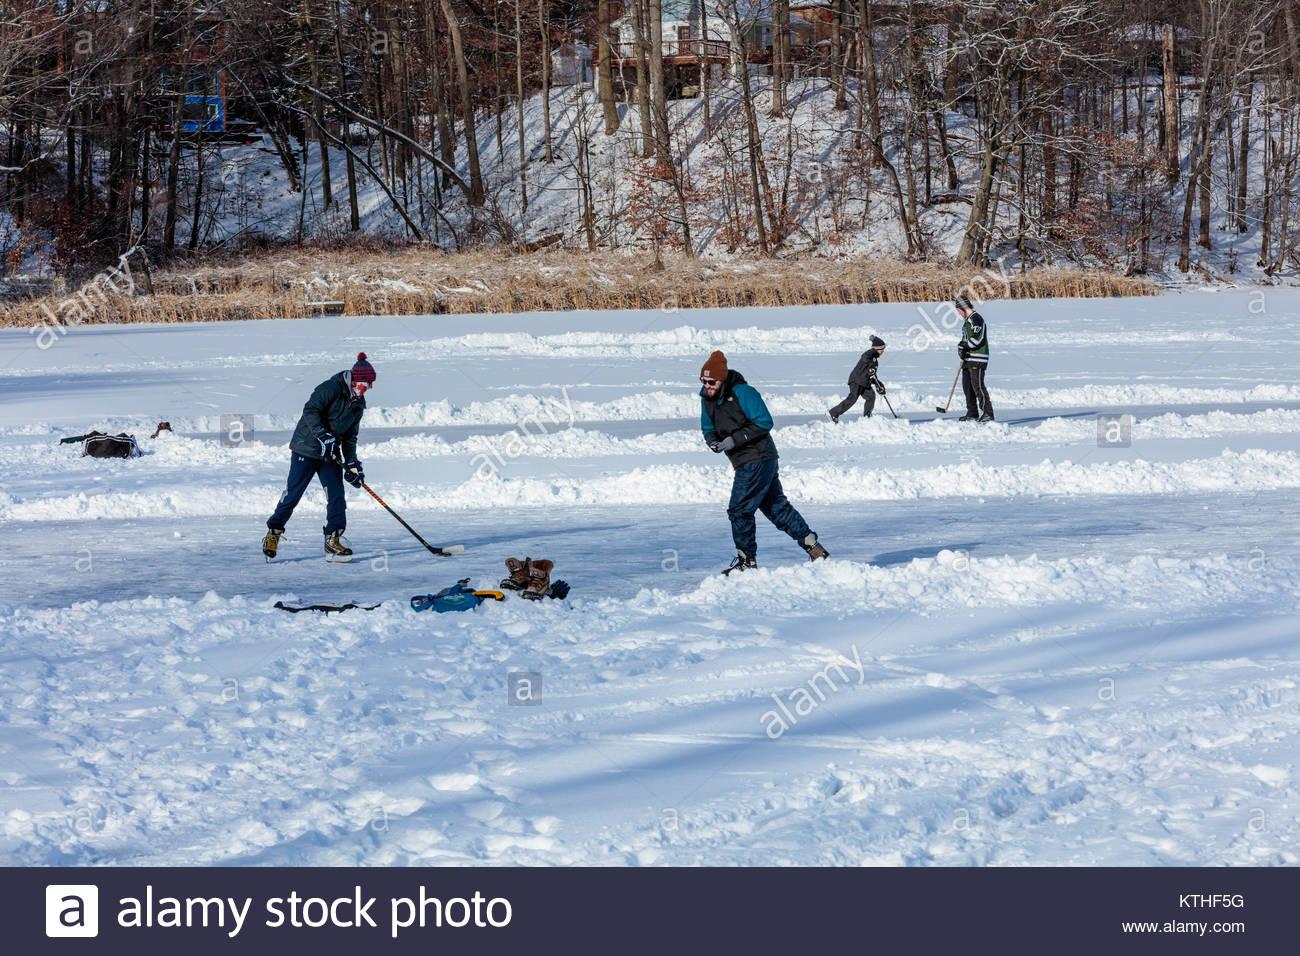 Canadian Hockey Stock Photos & Canadian Hockey Stock Images - Alamy